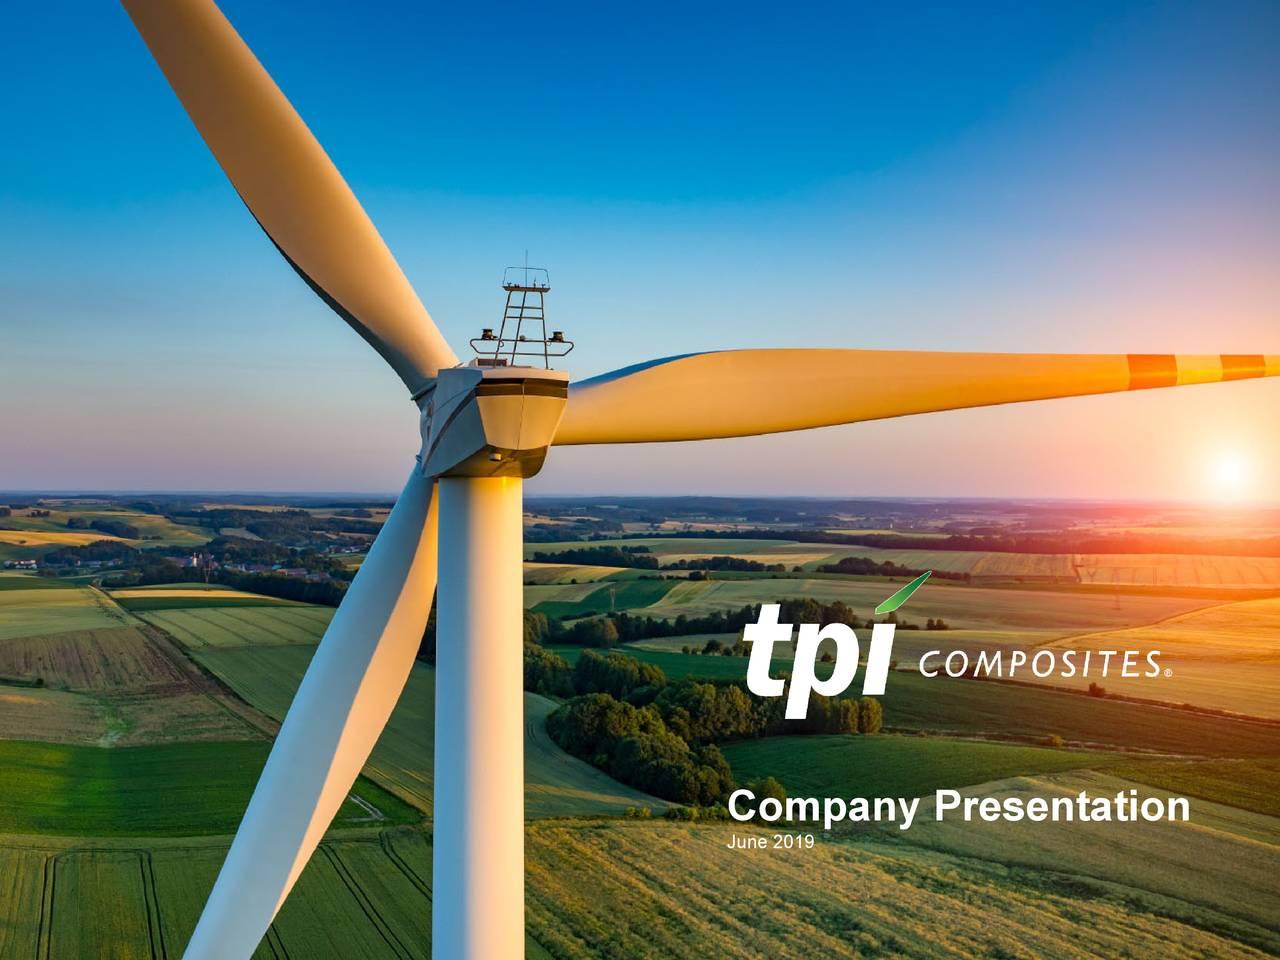 TPI Composites (TPIC) Investor Presentation - Slideshow